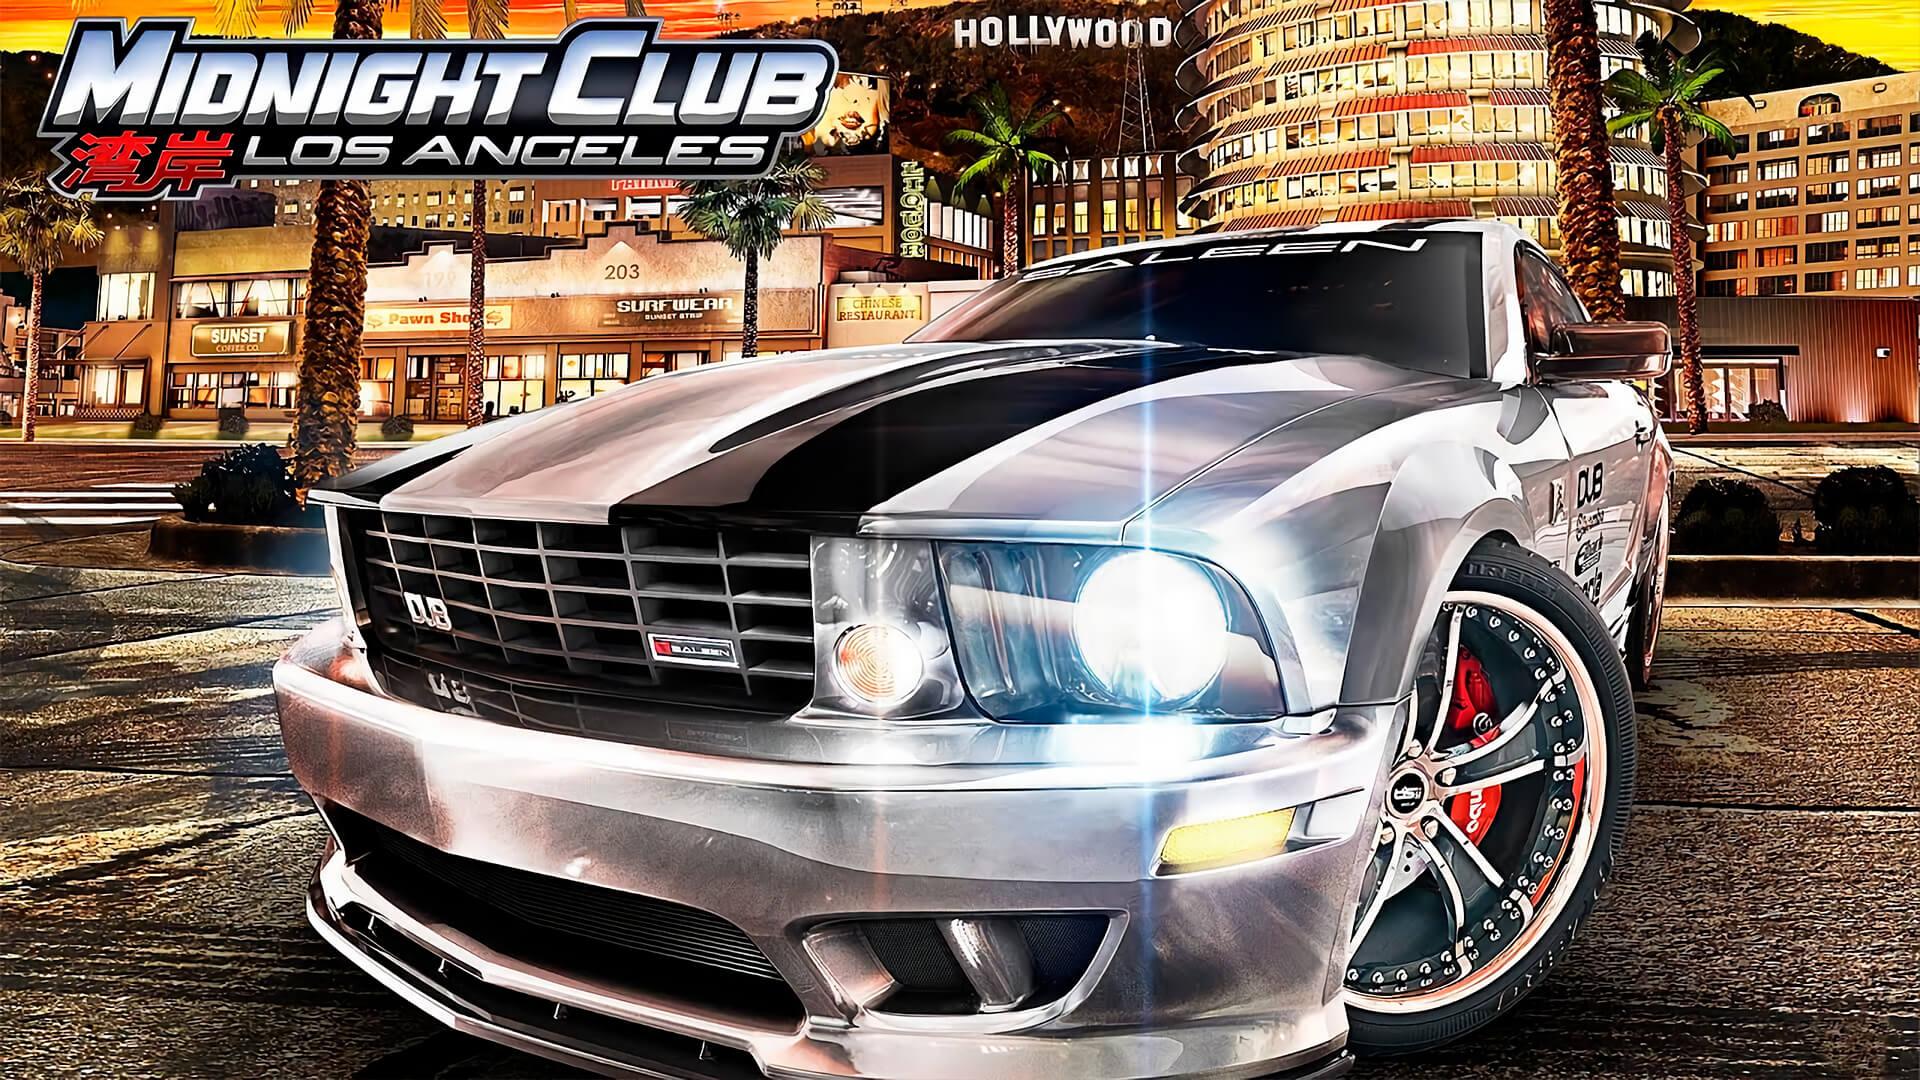 A Rockstar Games acaba de revelar que Midnight Club Los Angeles vai agora estar disponível para Xbox 360, Xbox One e Xbox Series S/X.